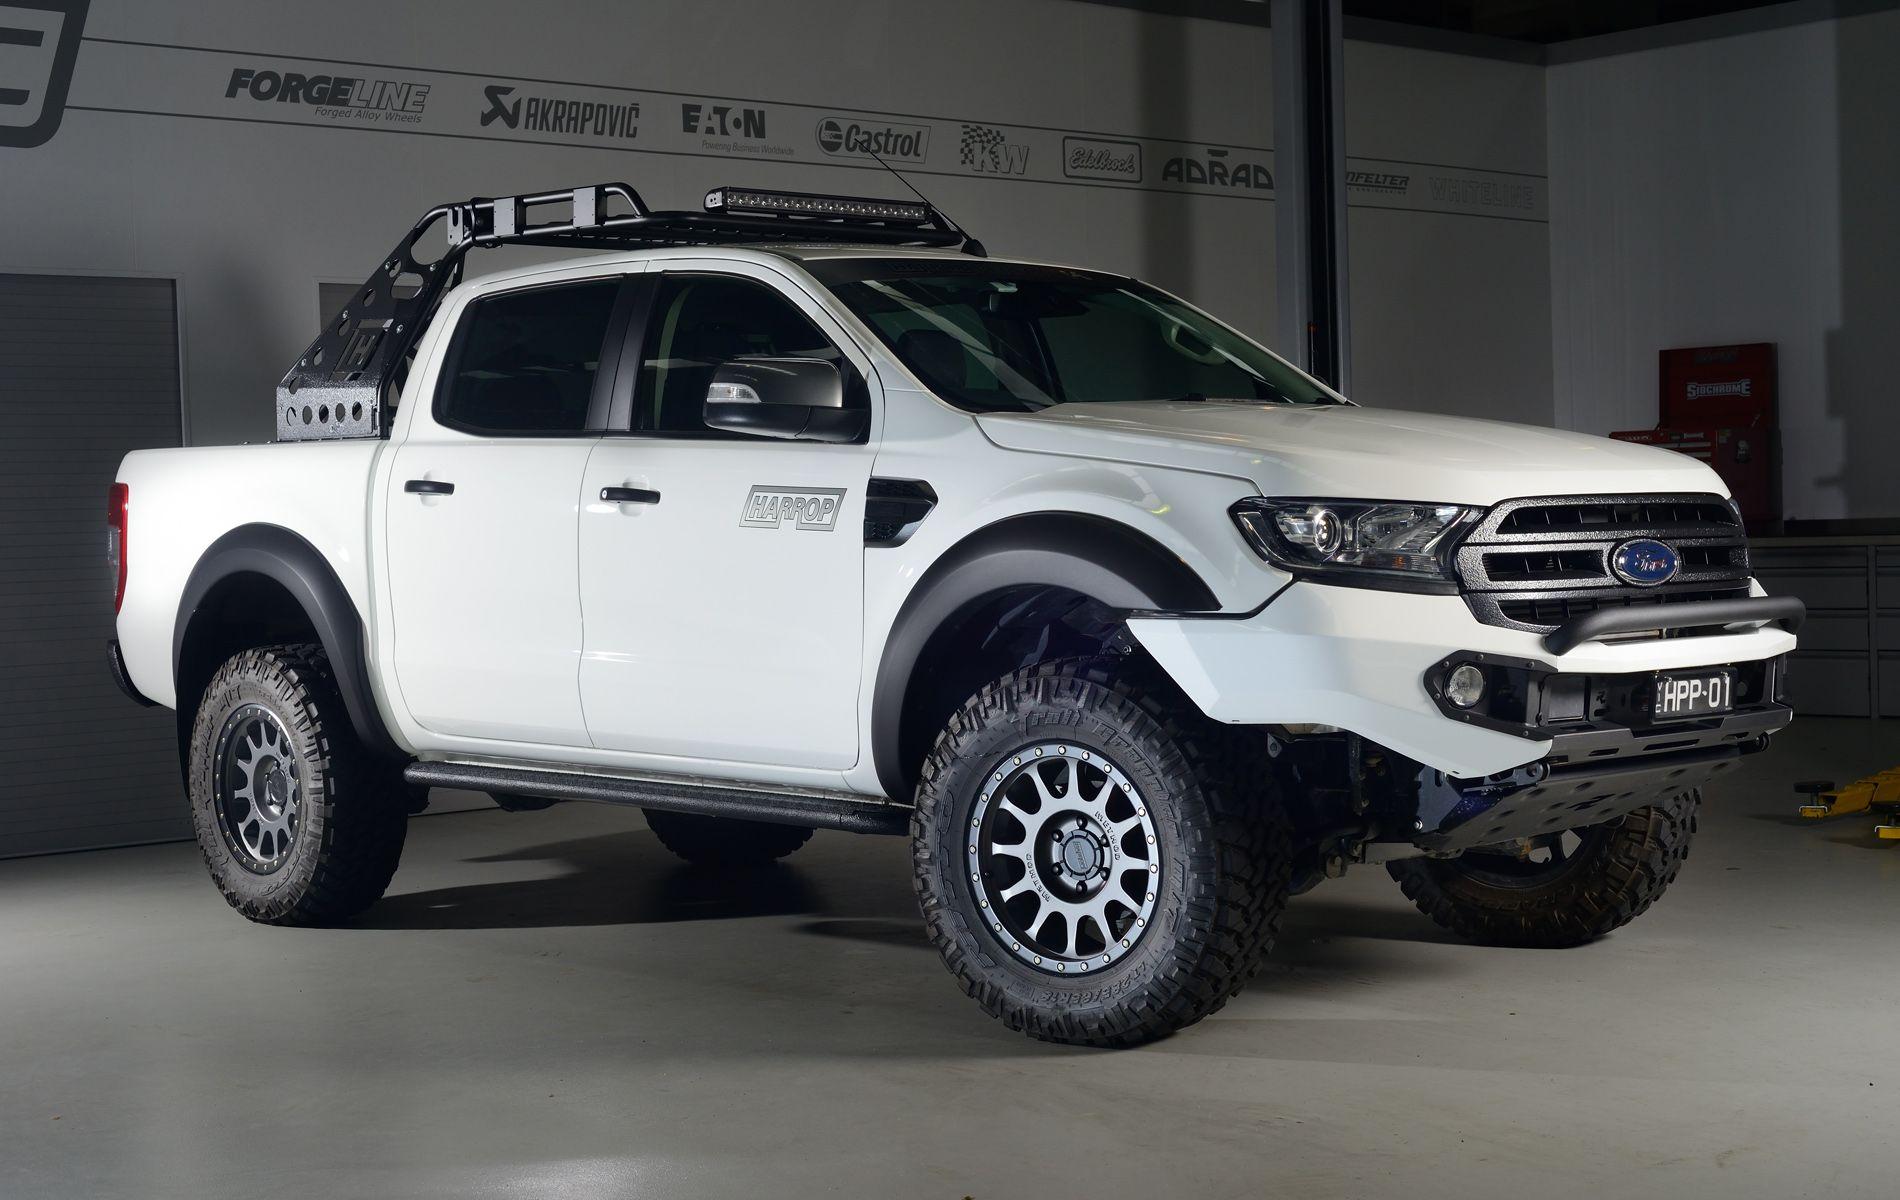 STYLING | Ford Ranger 2018 | Pinterest | Ford ranger, Ford and Ford ...